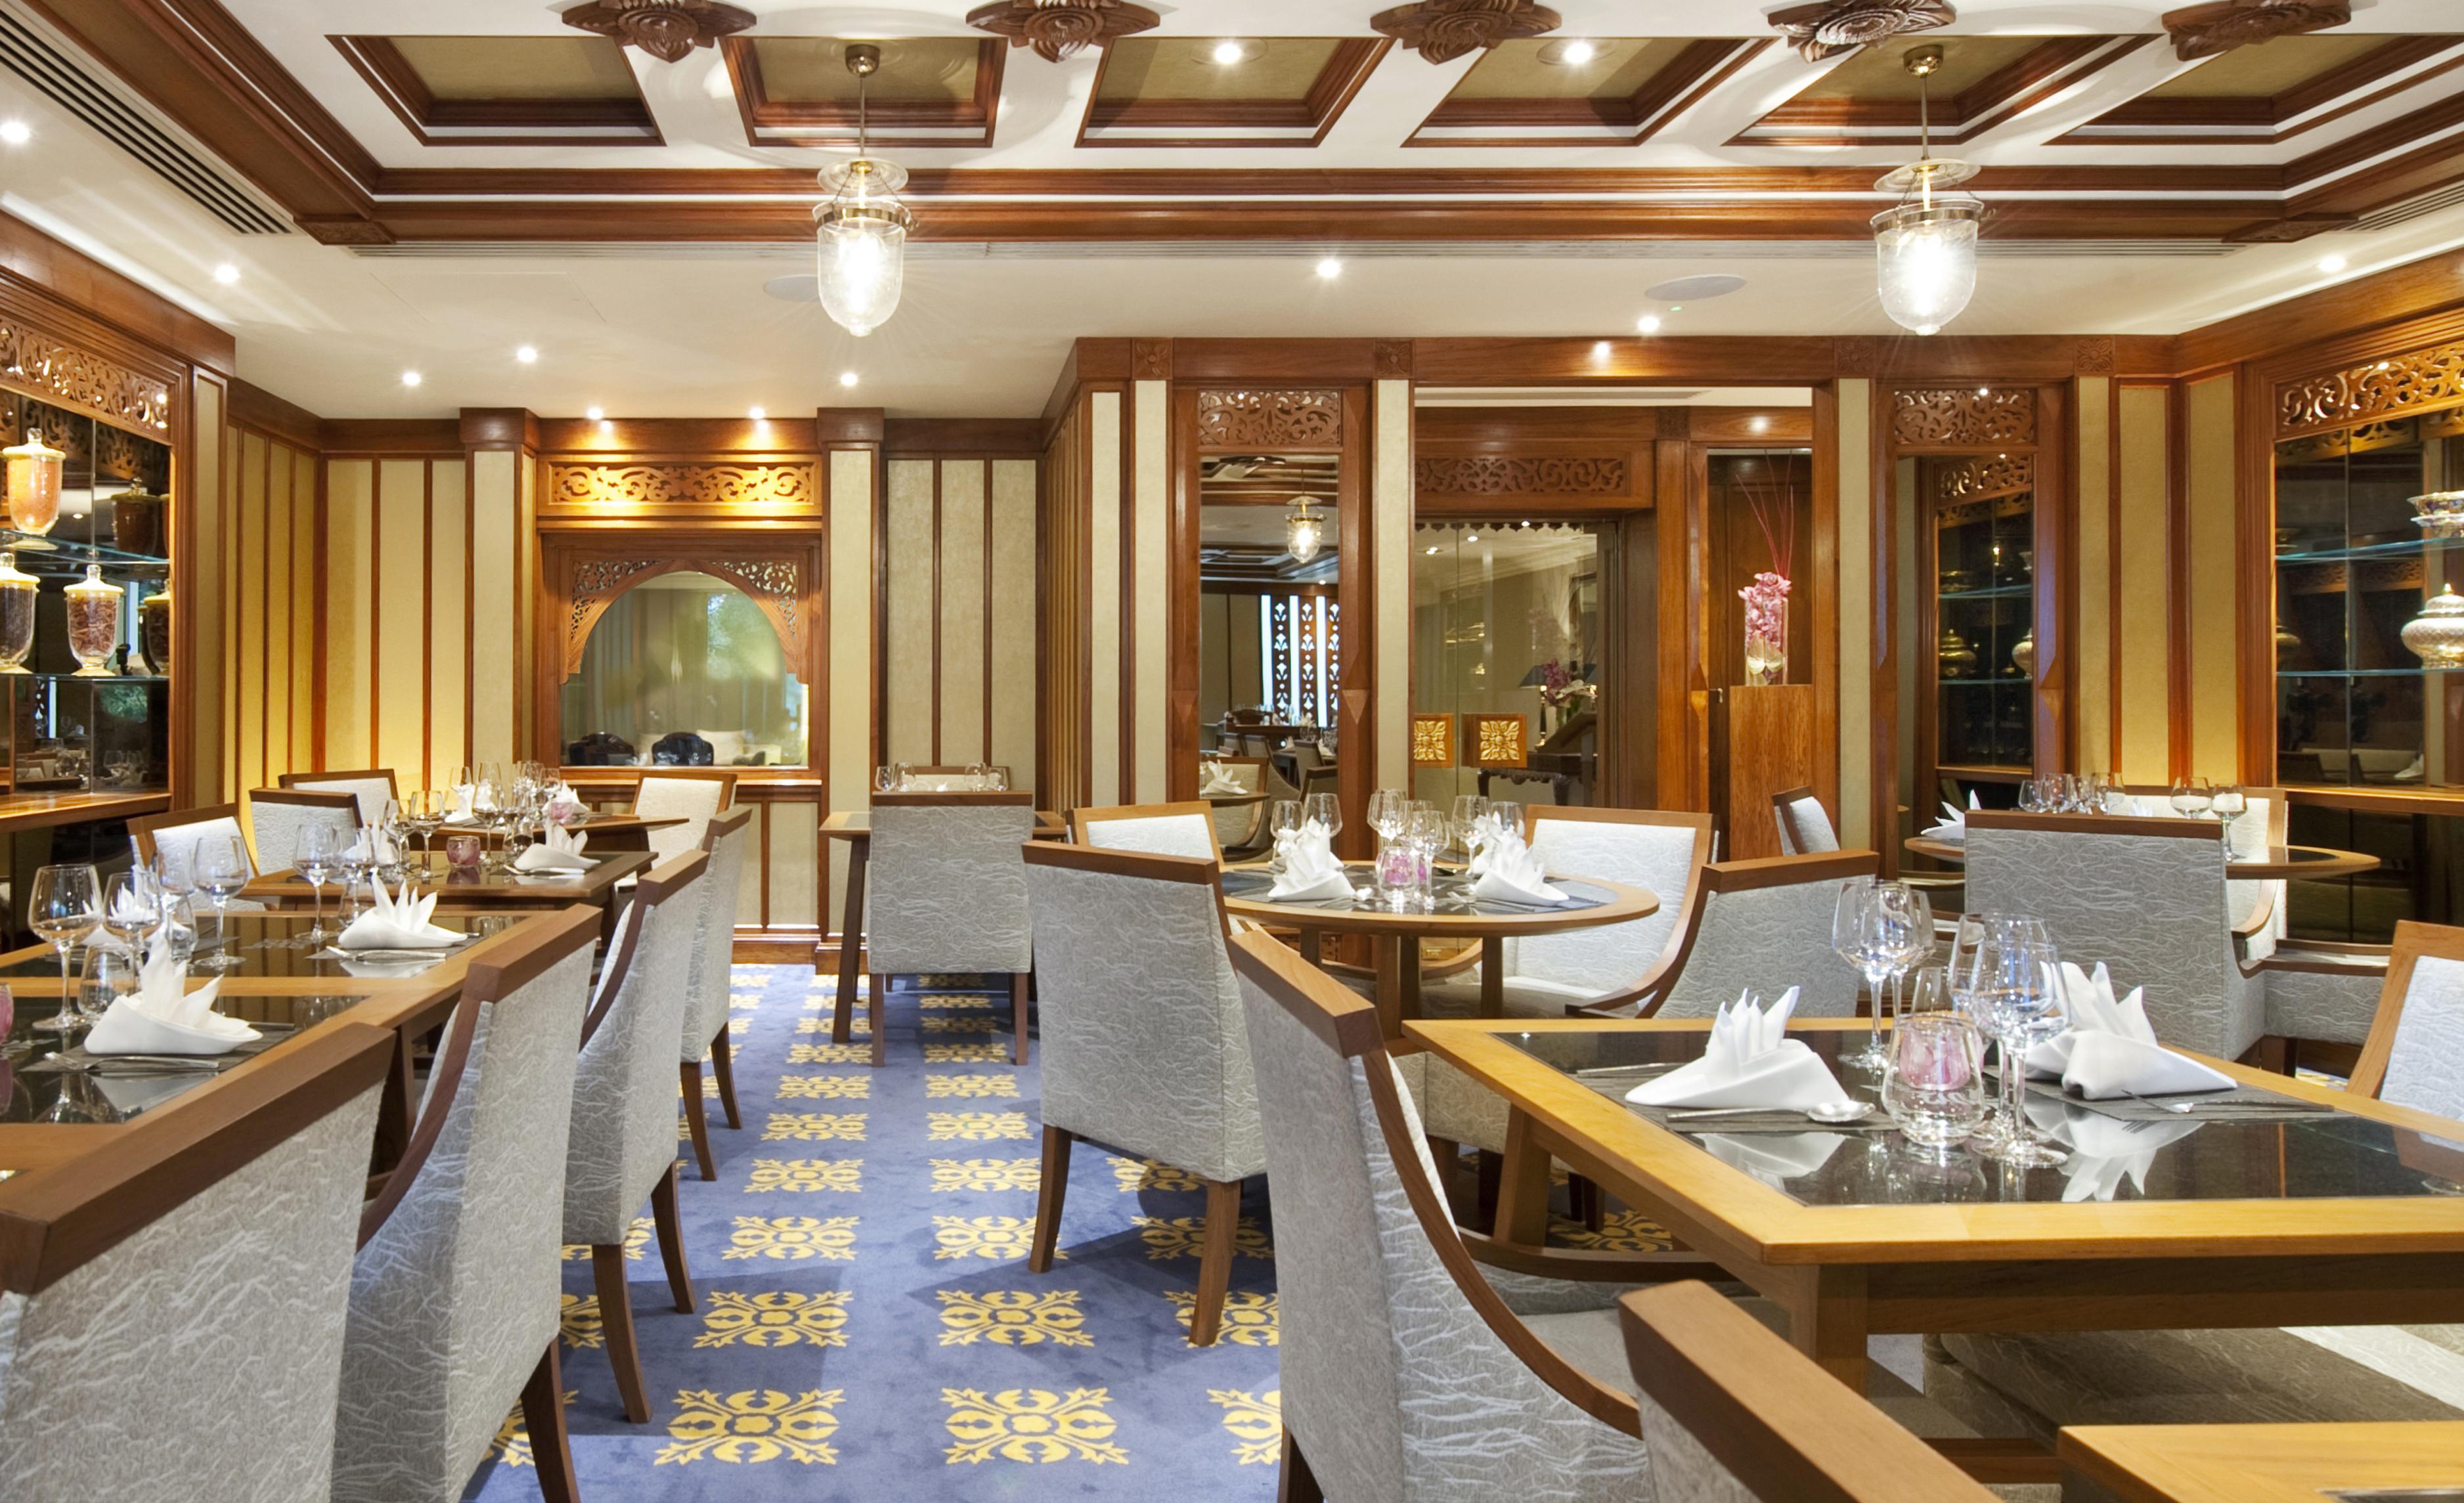 interior design for hotels and restaurants london